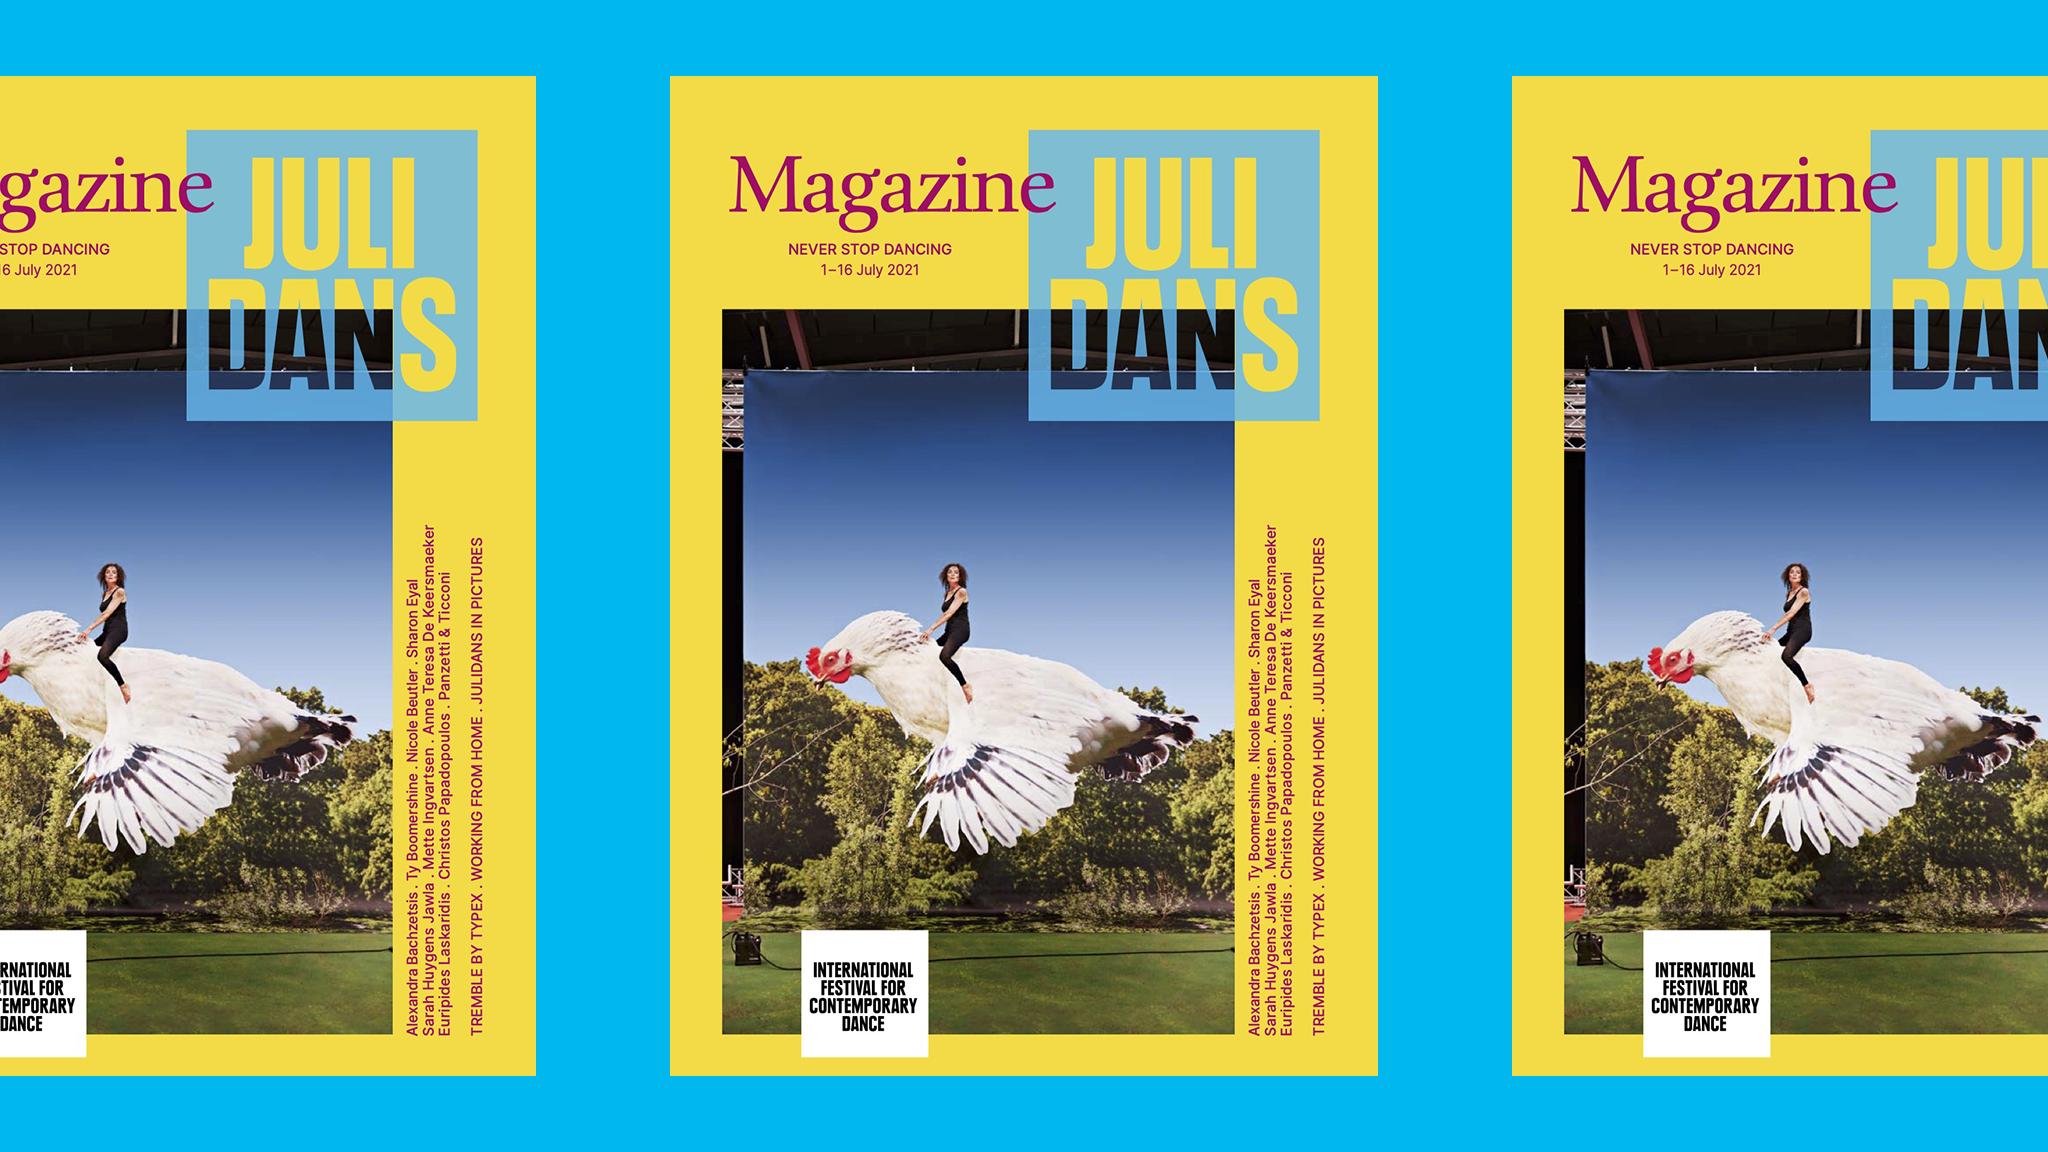 Julidans magazine